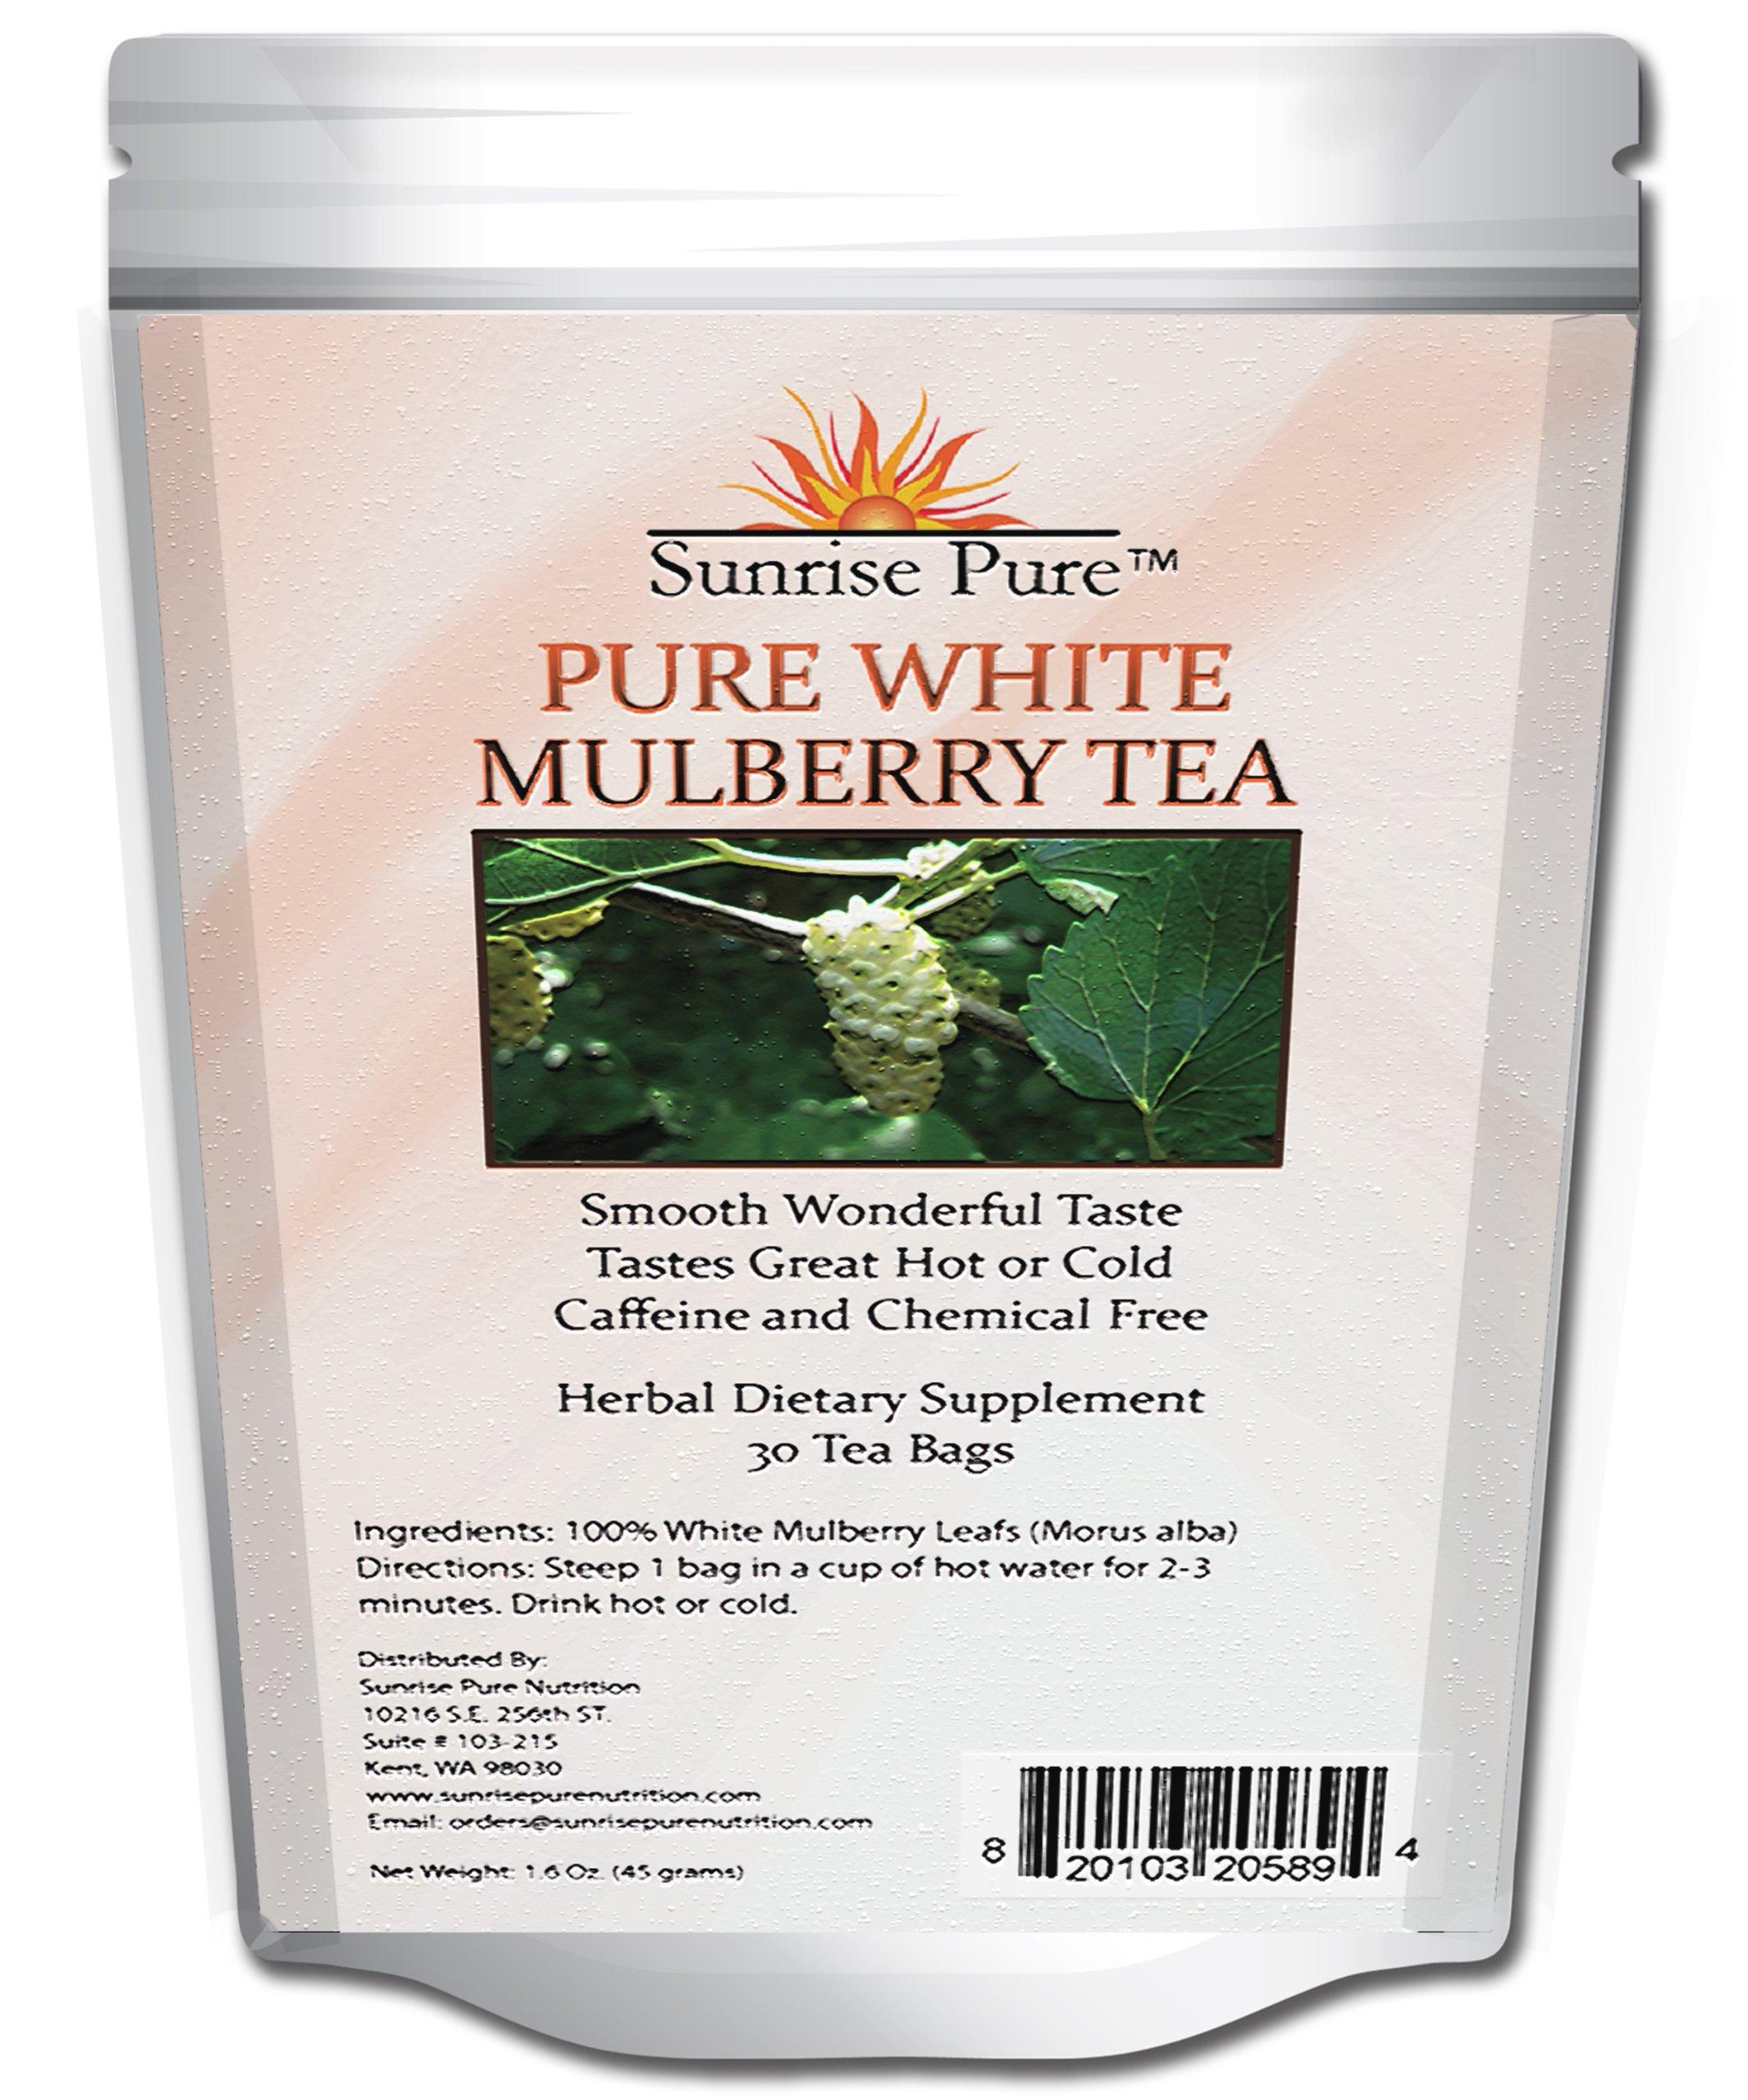 Mulberry Tea - White | Blood Sugar Controller Tea | Great Hot or Cold | White Mulberry Tea (Morus Alba) | Caffeine Free | Great Reviews | Weight Loss Tea | Sunrise Pure Nutrition Guarantee